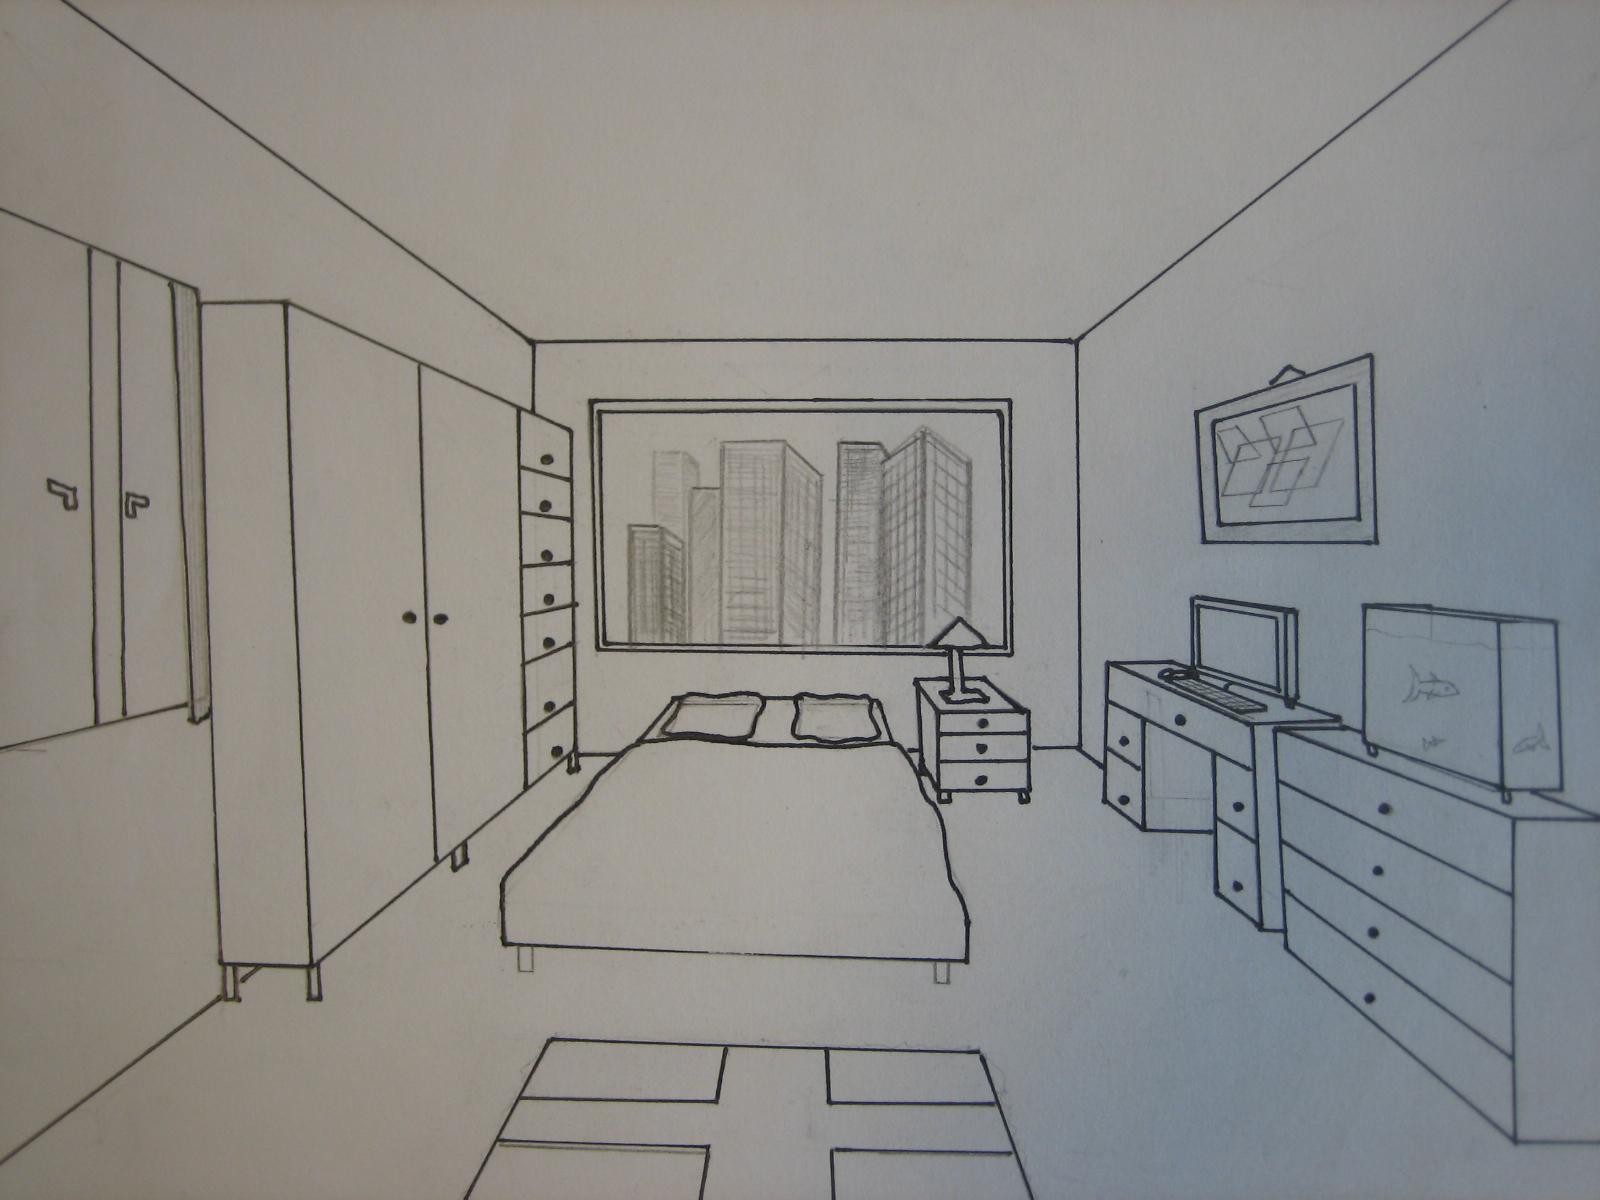 Chambre En Perspective Lineaire